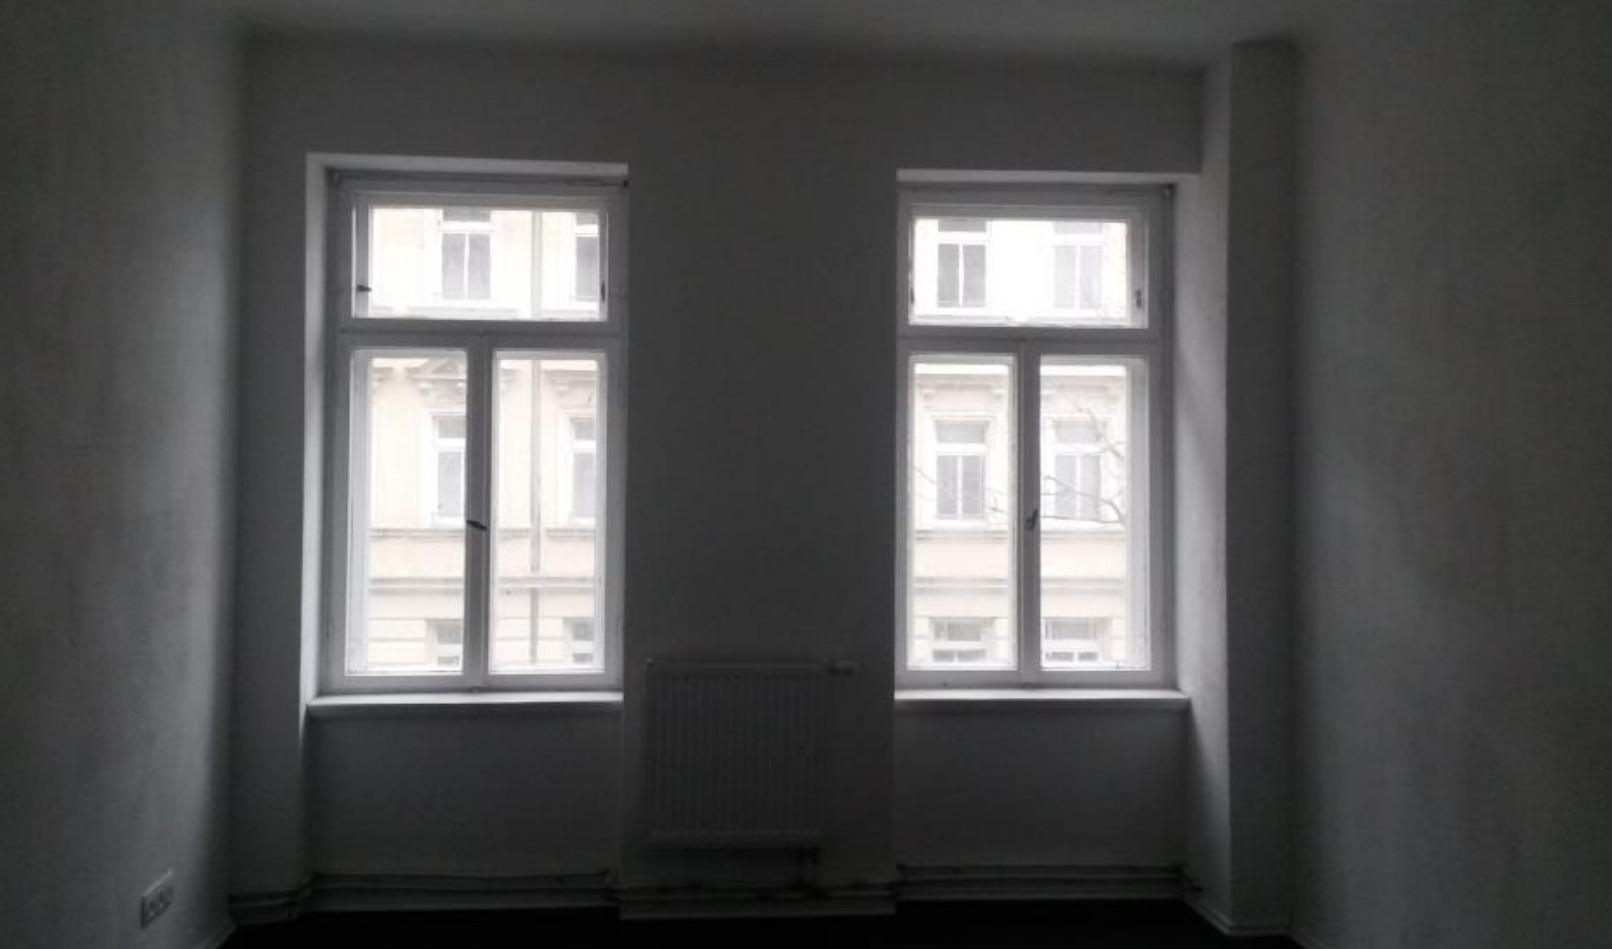 Paulinenstraße 1, 04315 Leipzig, Germany